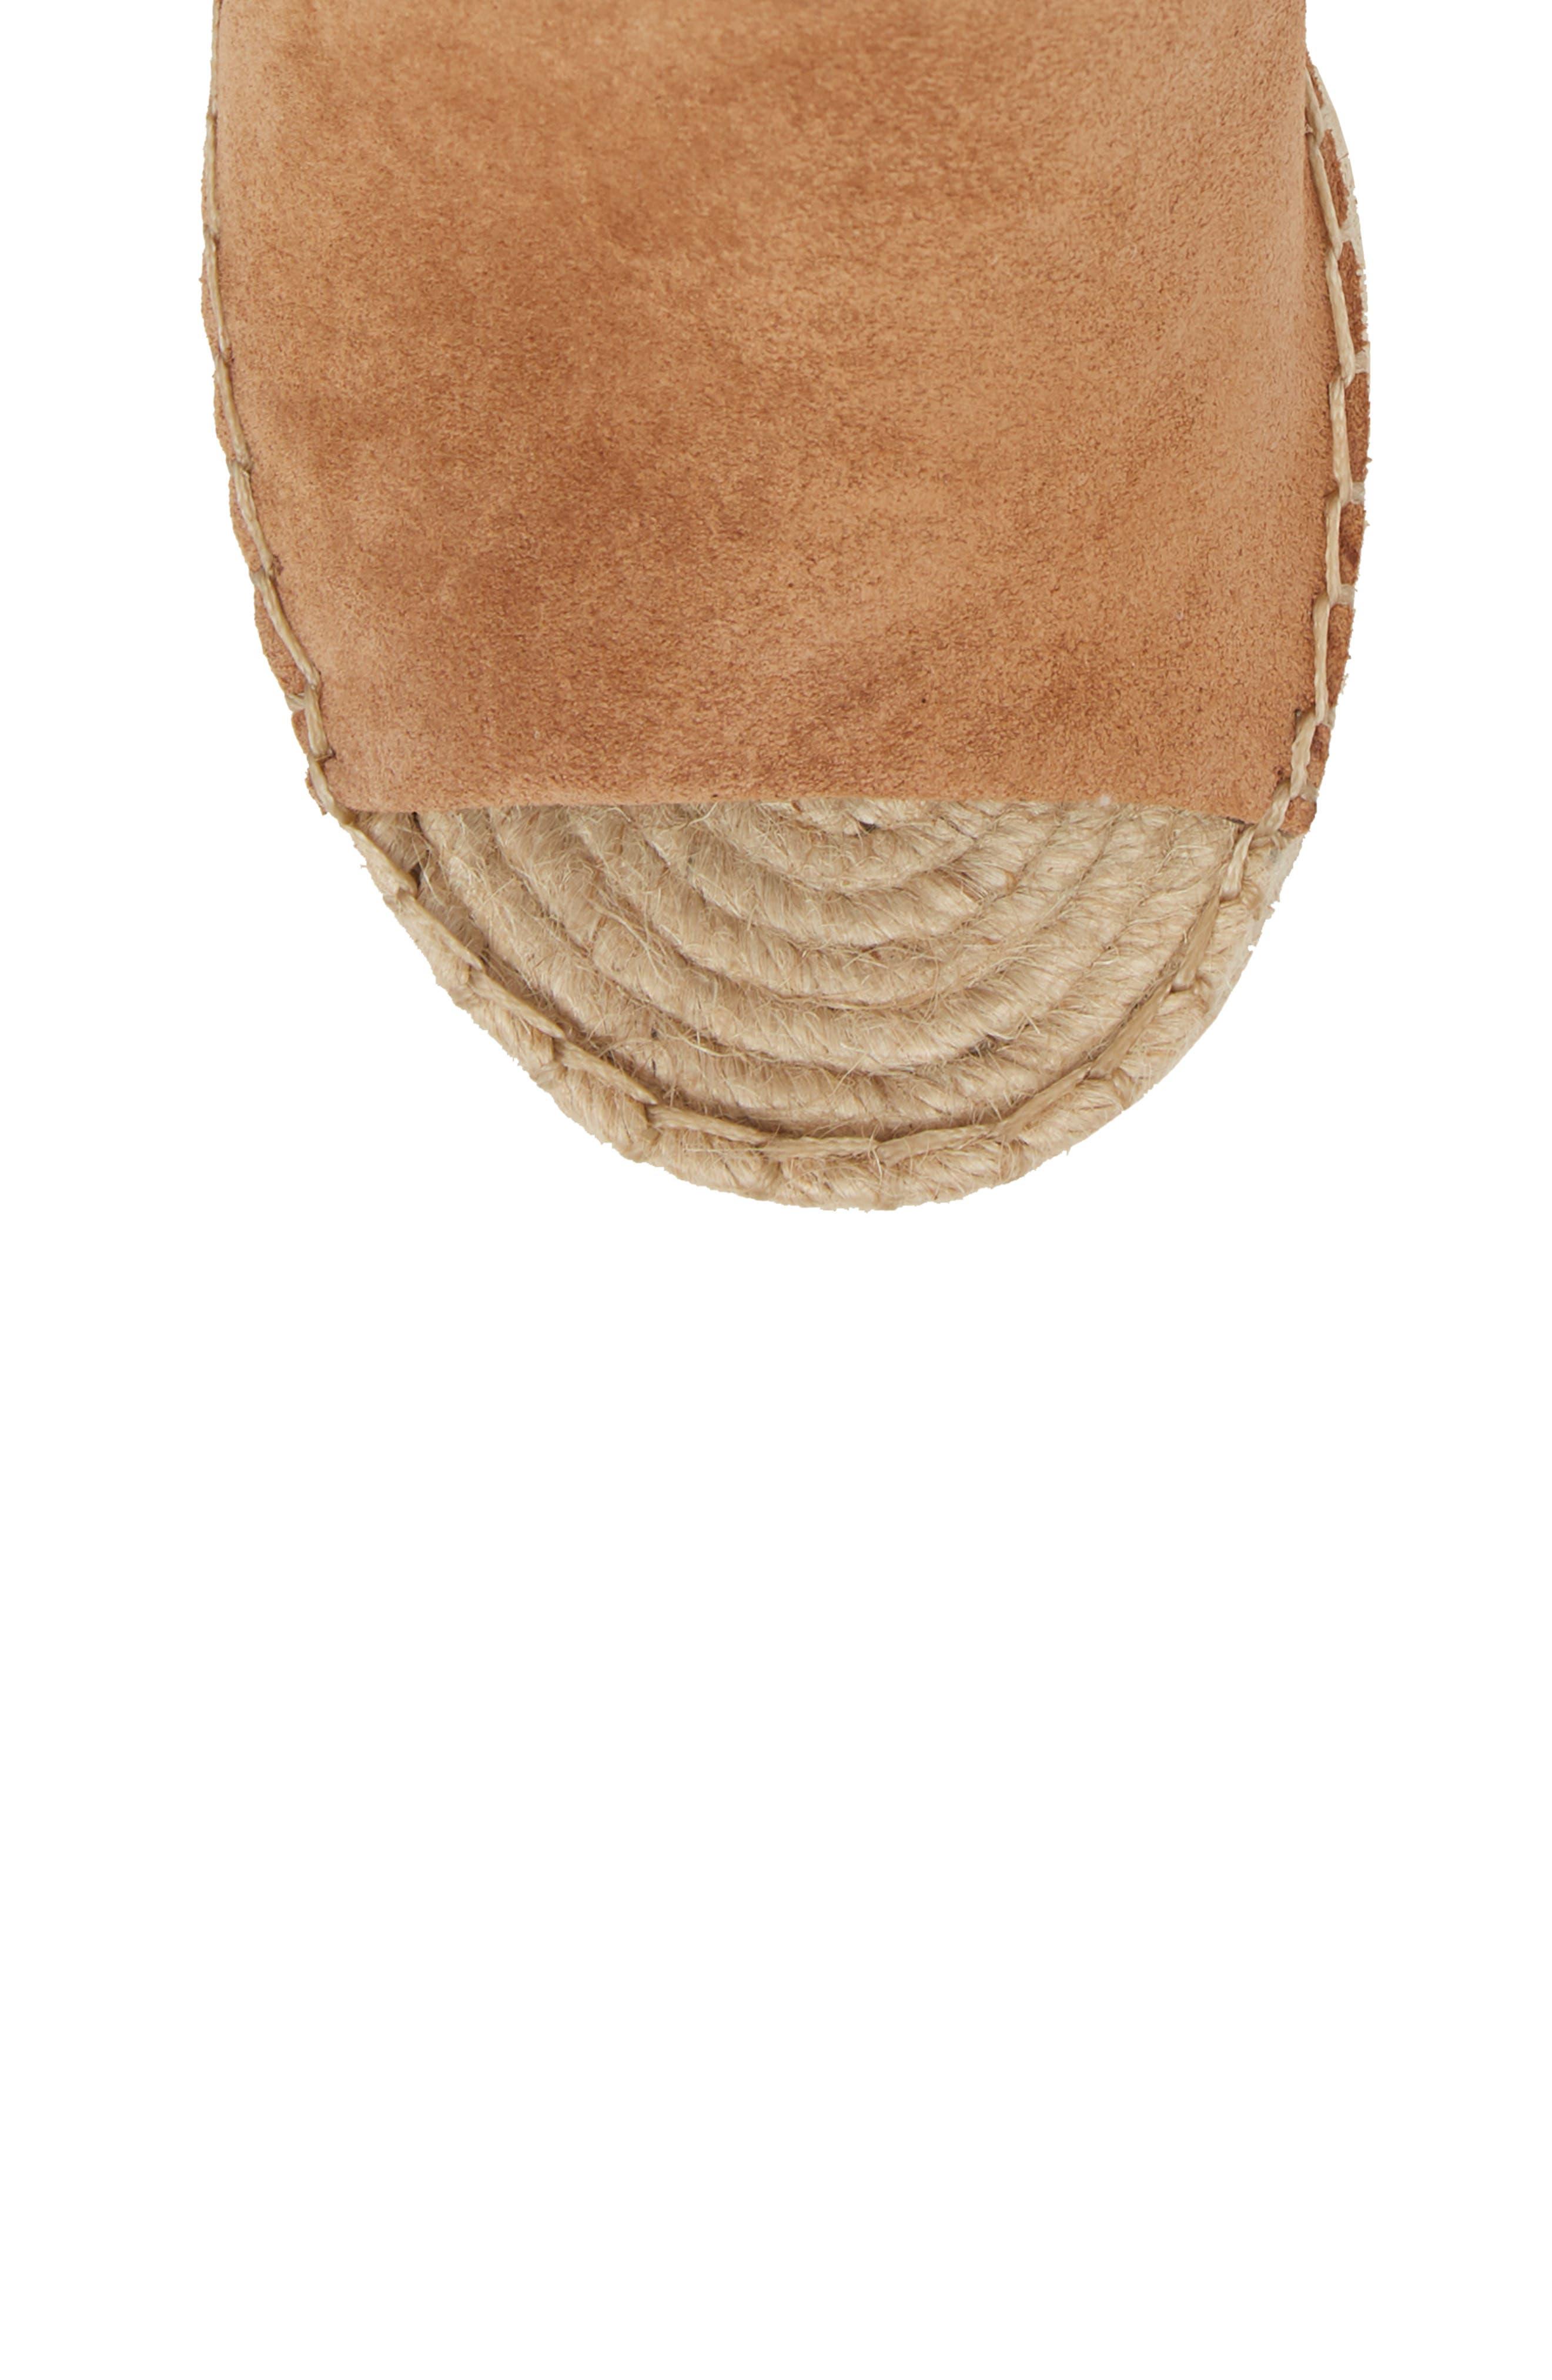 Straw Wedge Espadrille Sandal,                             Alternate thumbnail 5, color,                             Dark Saddle